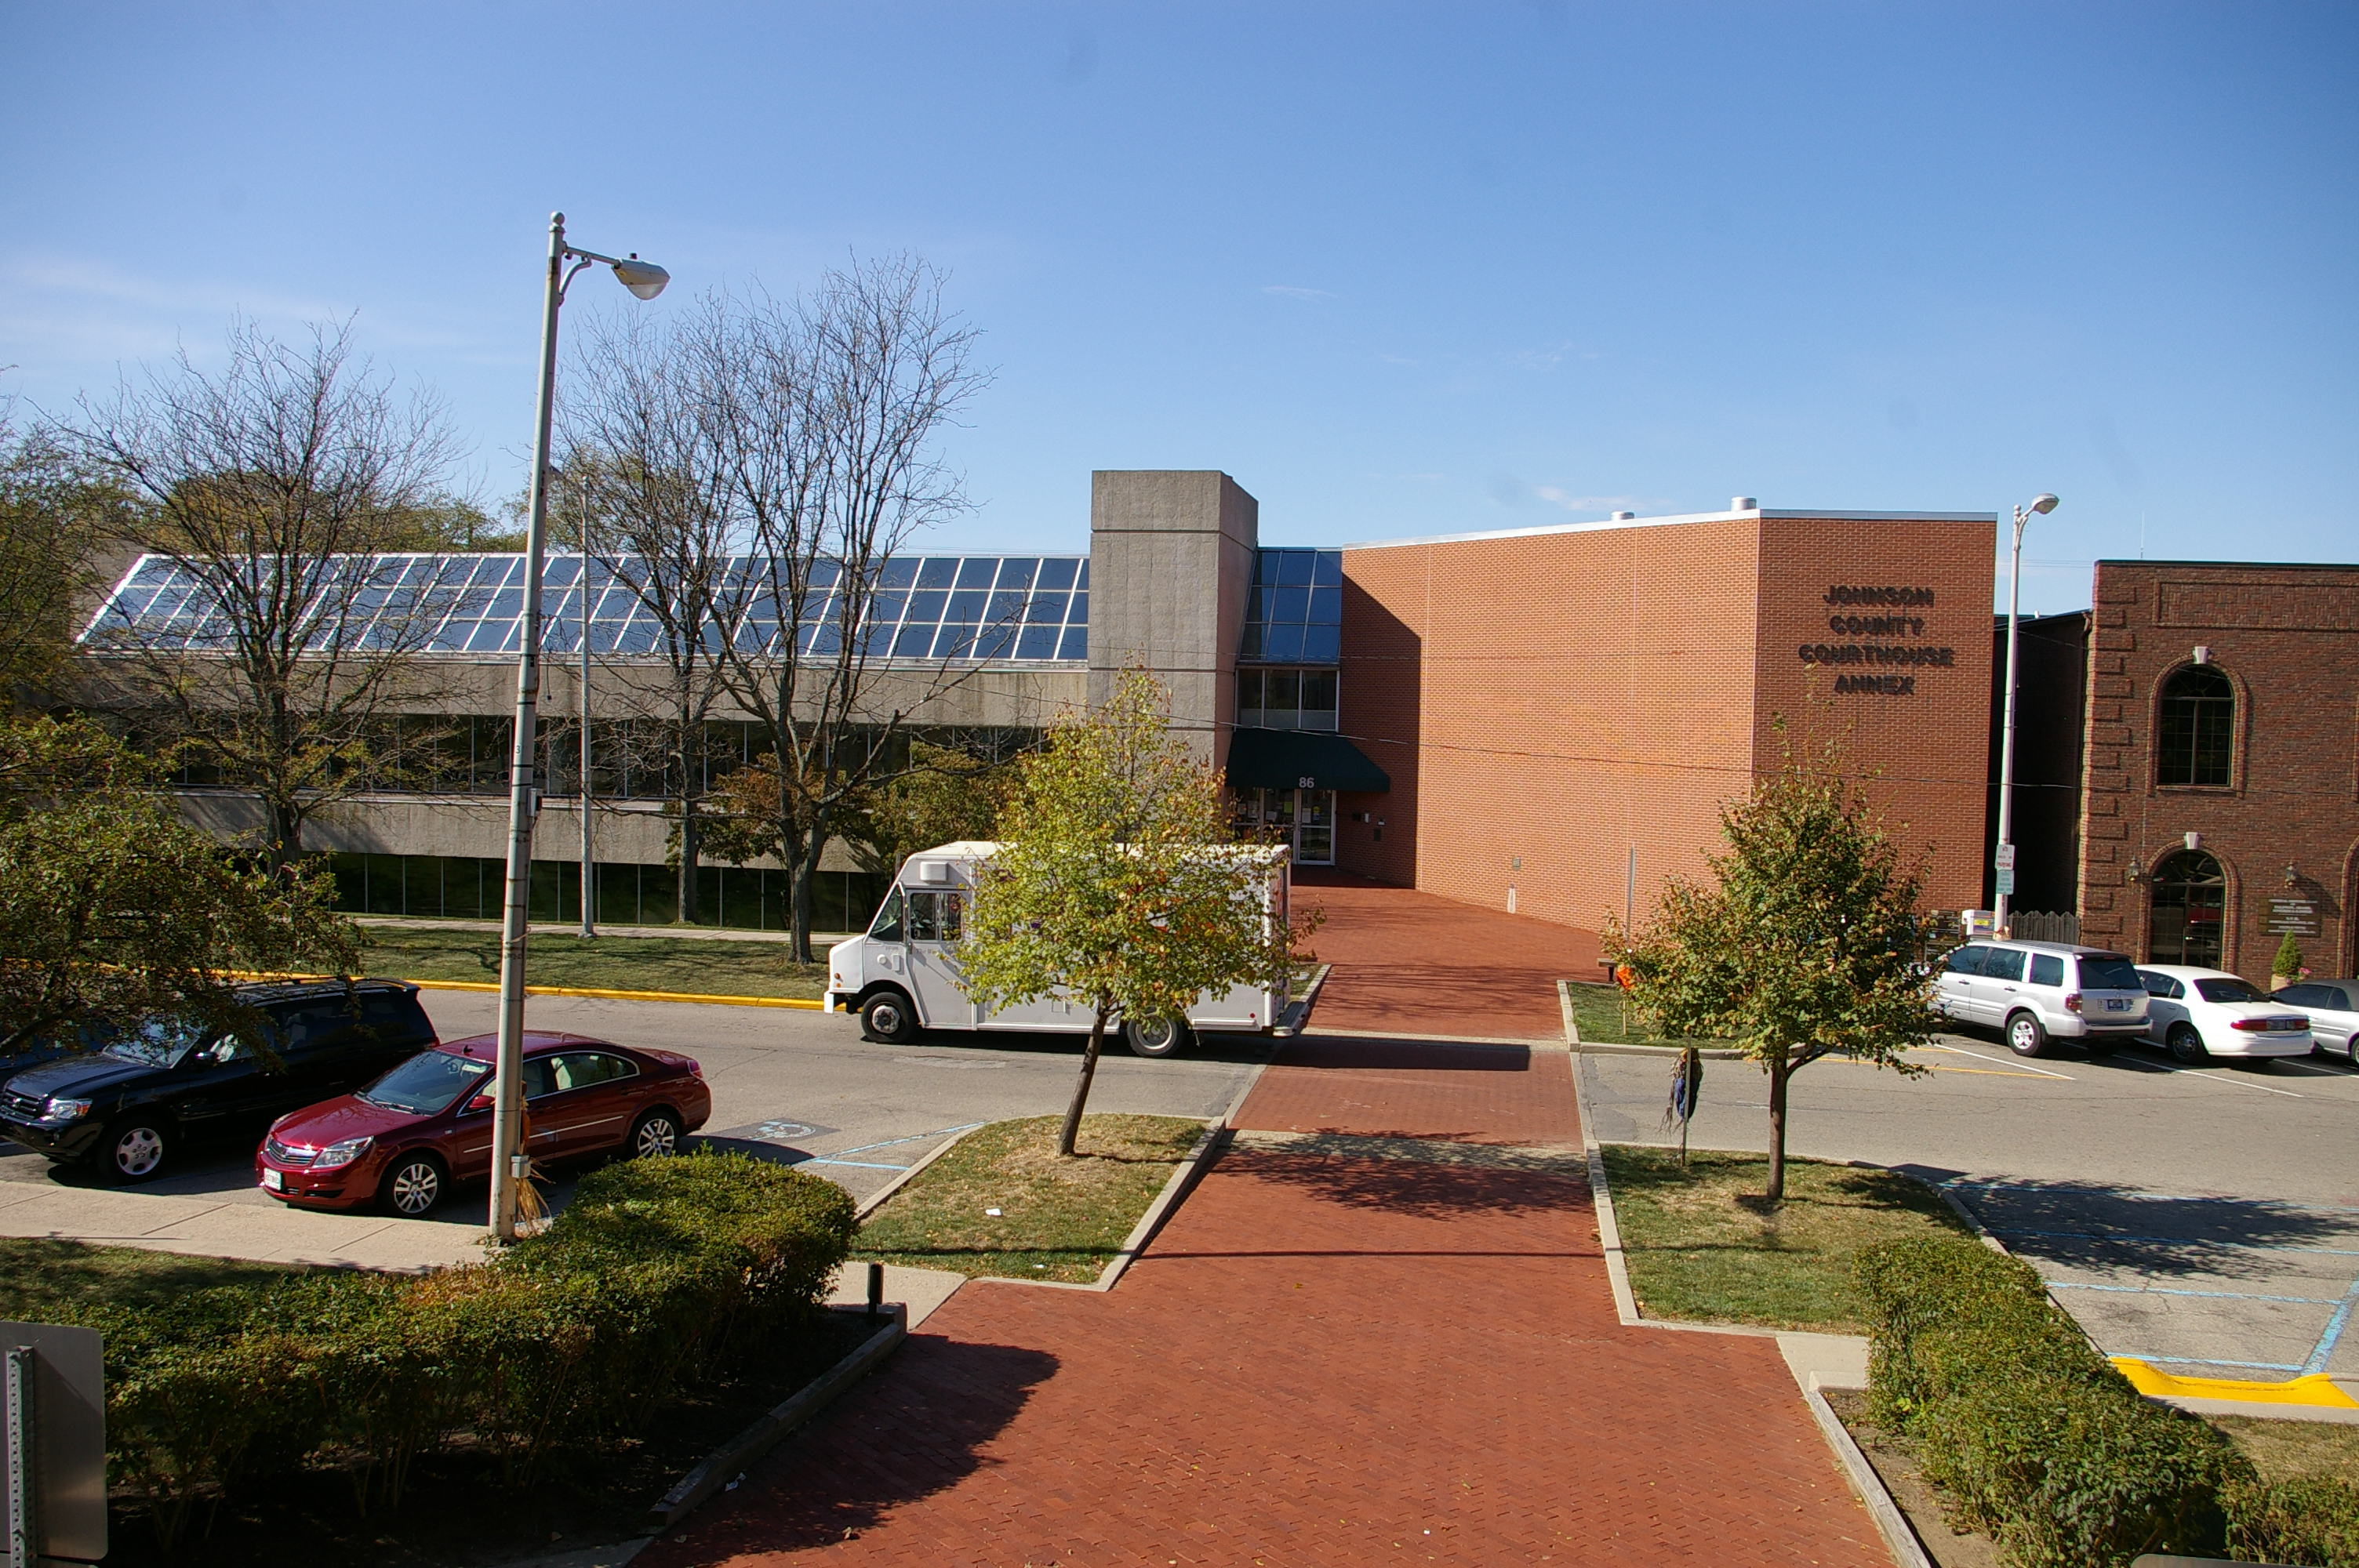 Wayne County Indiana Annex Building